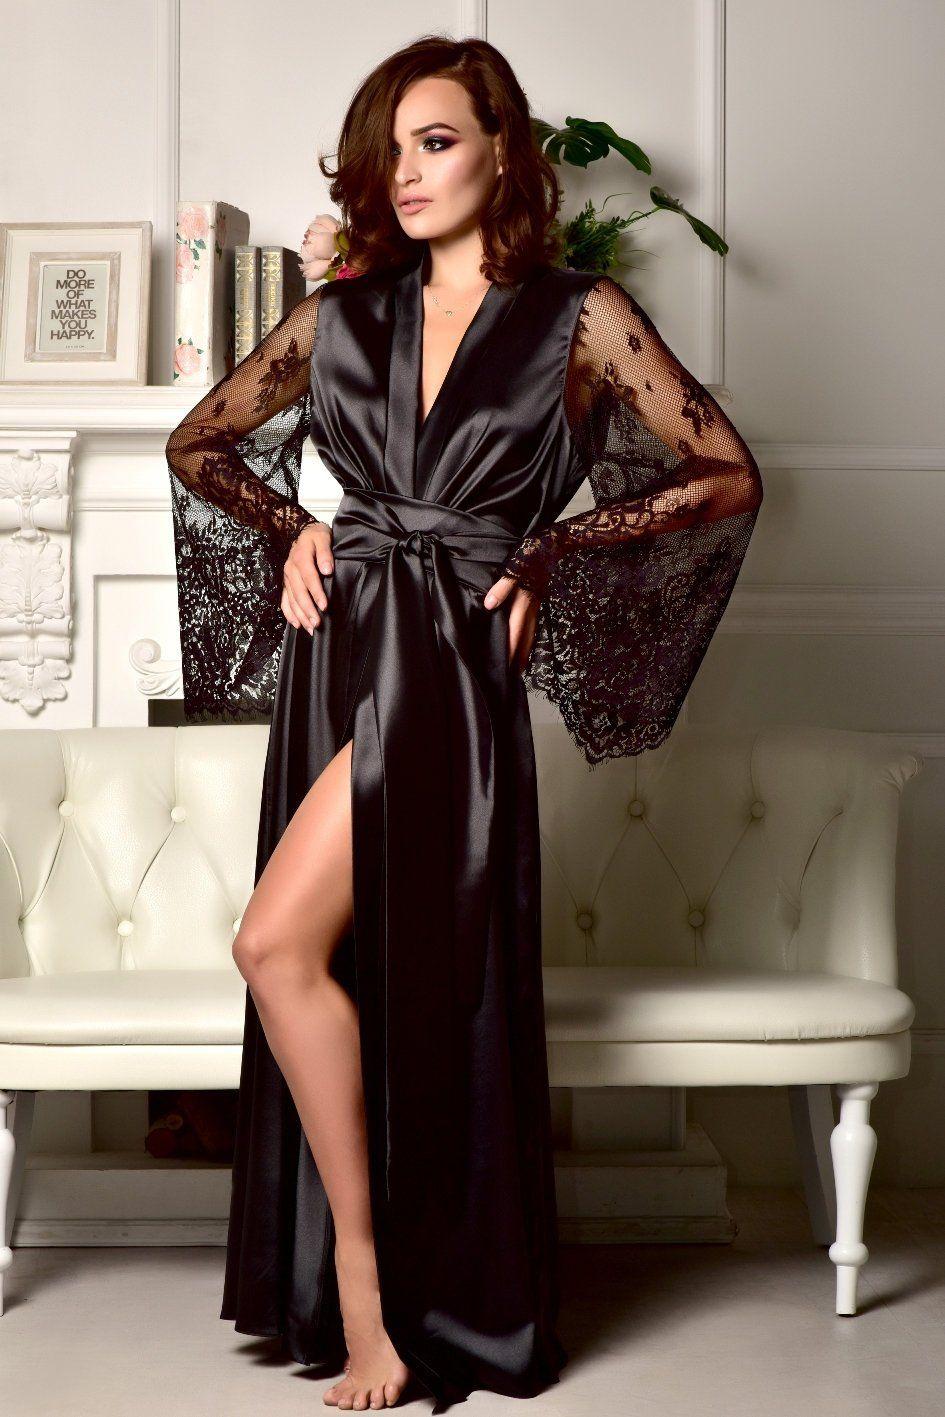 ad6bd627ffc Black lace bridal robe Sexy robe Kimono robe Long robe Long bridal ...